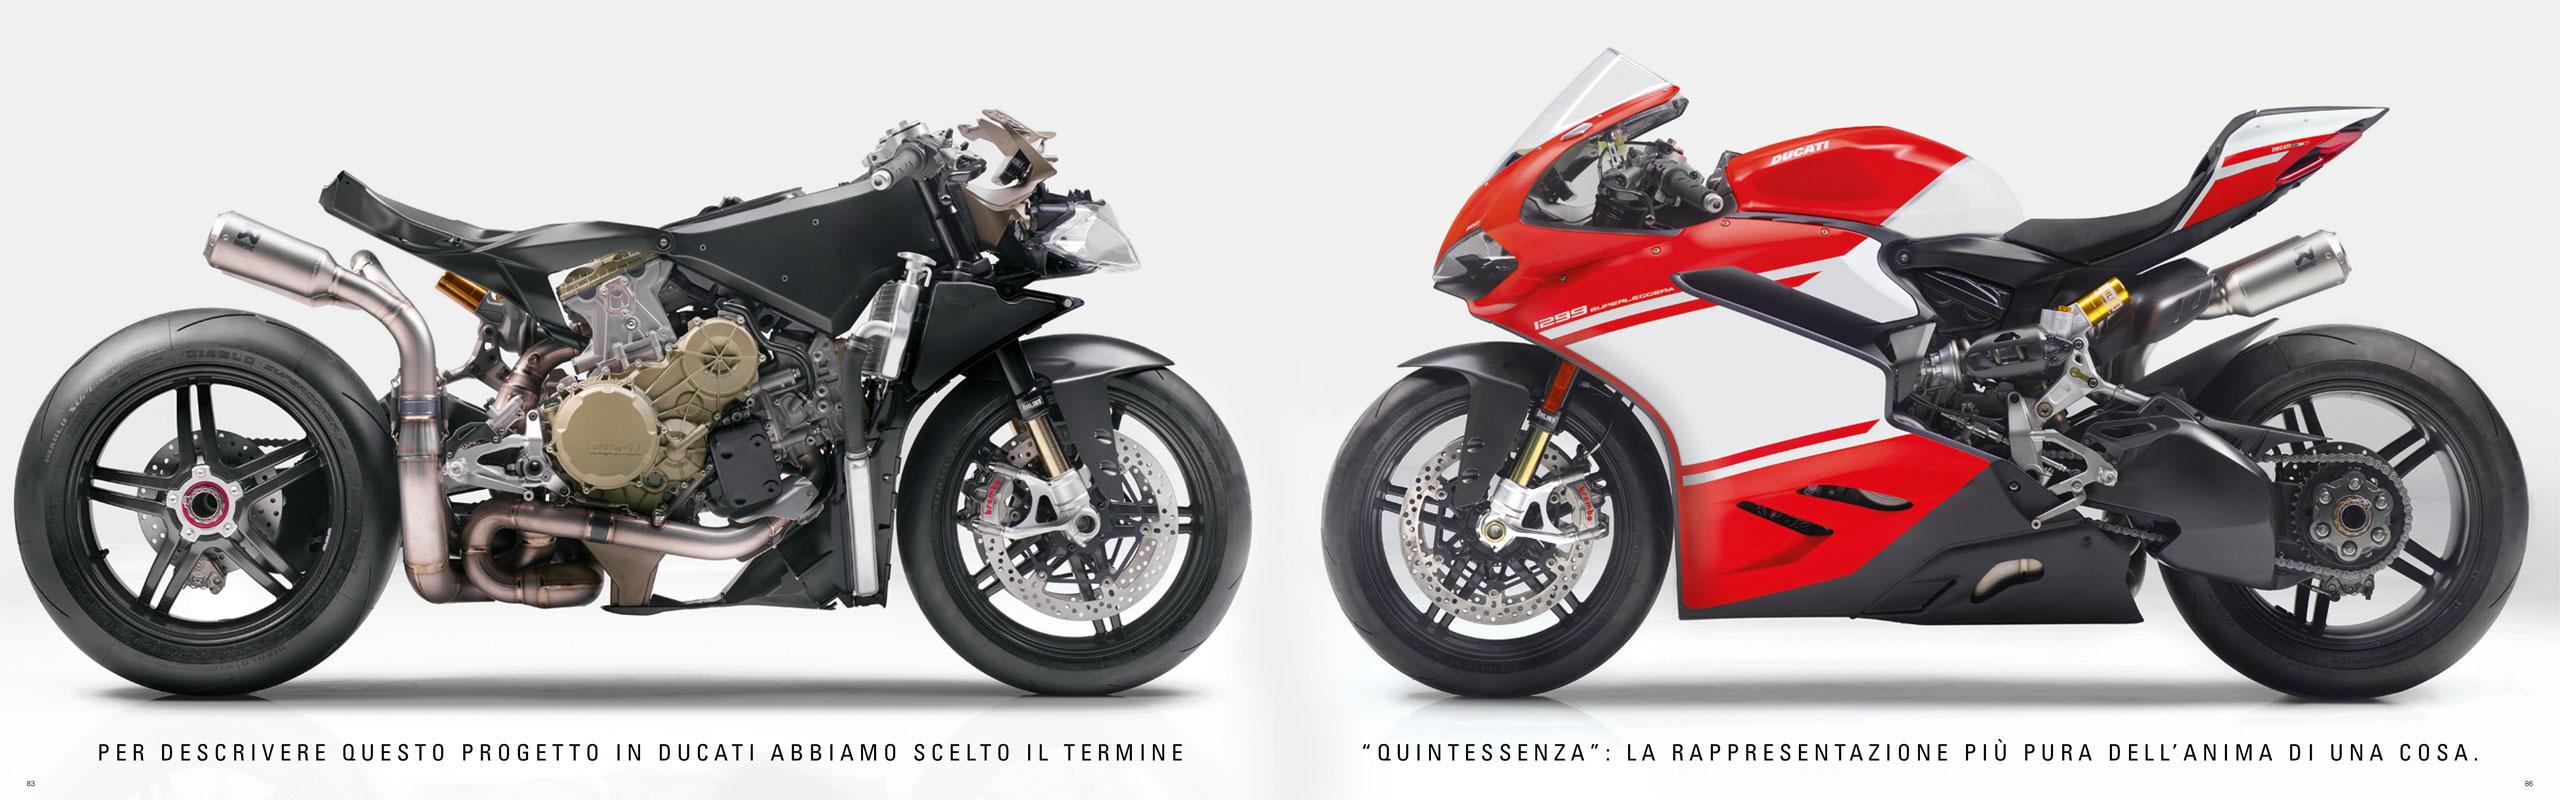 Ducati Redline Likecube